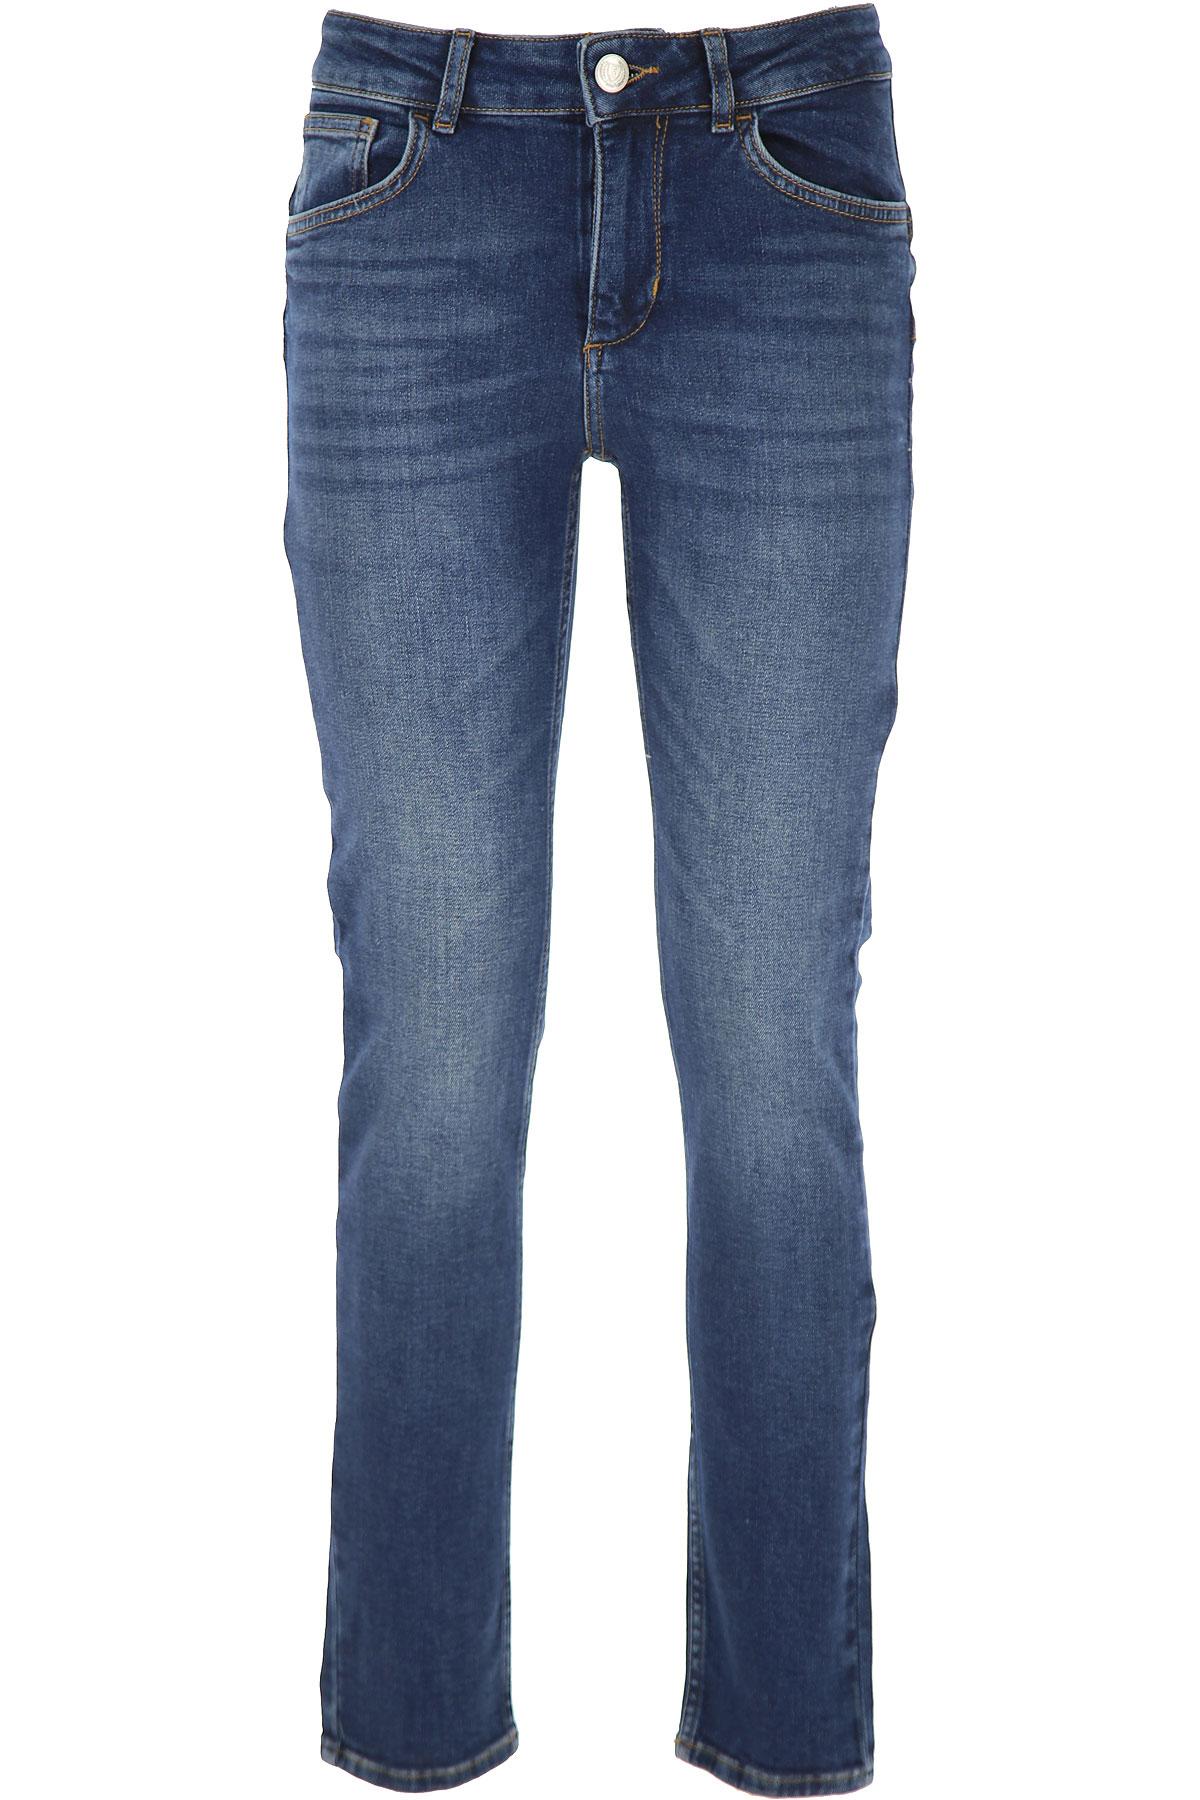 Silvian Heach Jeans On Sale, Denim Blue, Cotton, 2019, 25 26 27 28 29 30